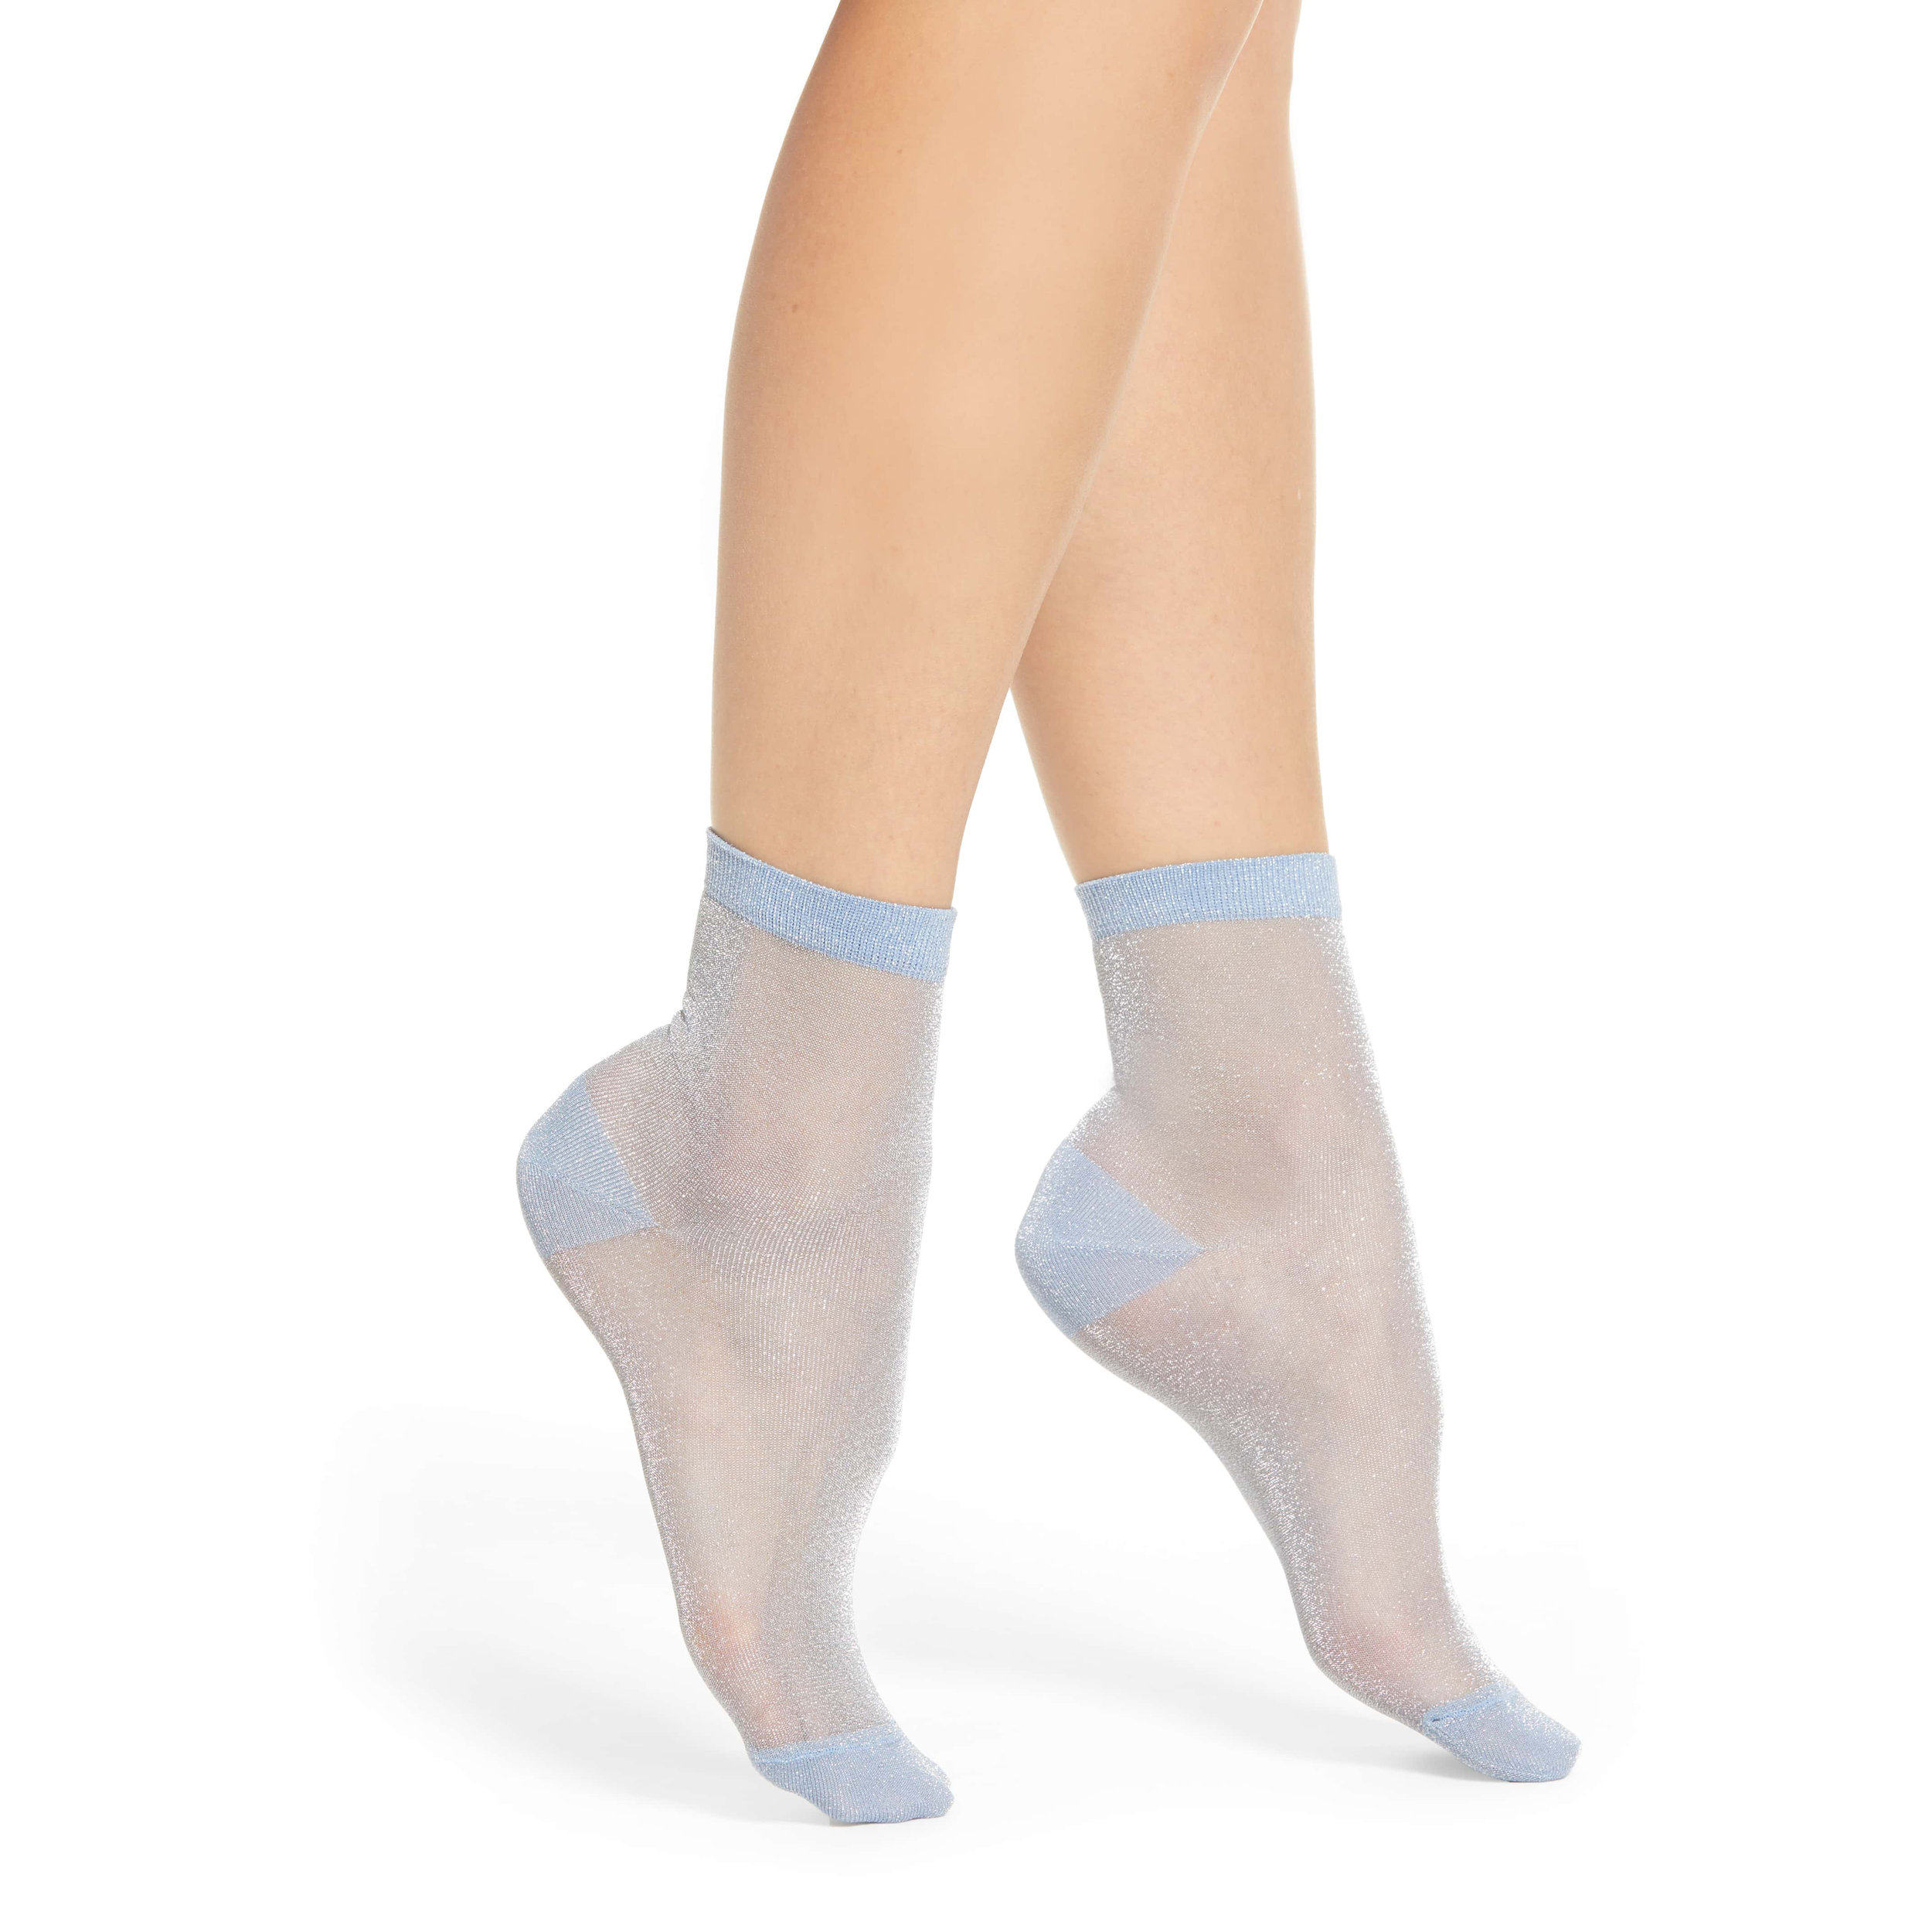 Halogen x Atlantic-Pacific Shimmer Ankle Socks, Nordstrom, $10 -